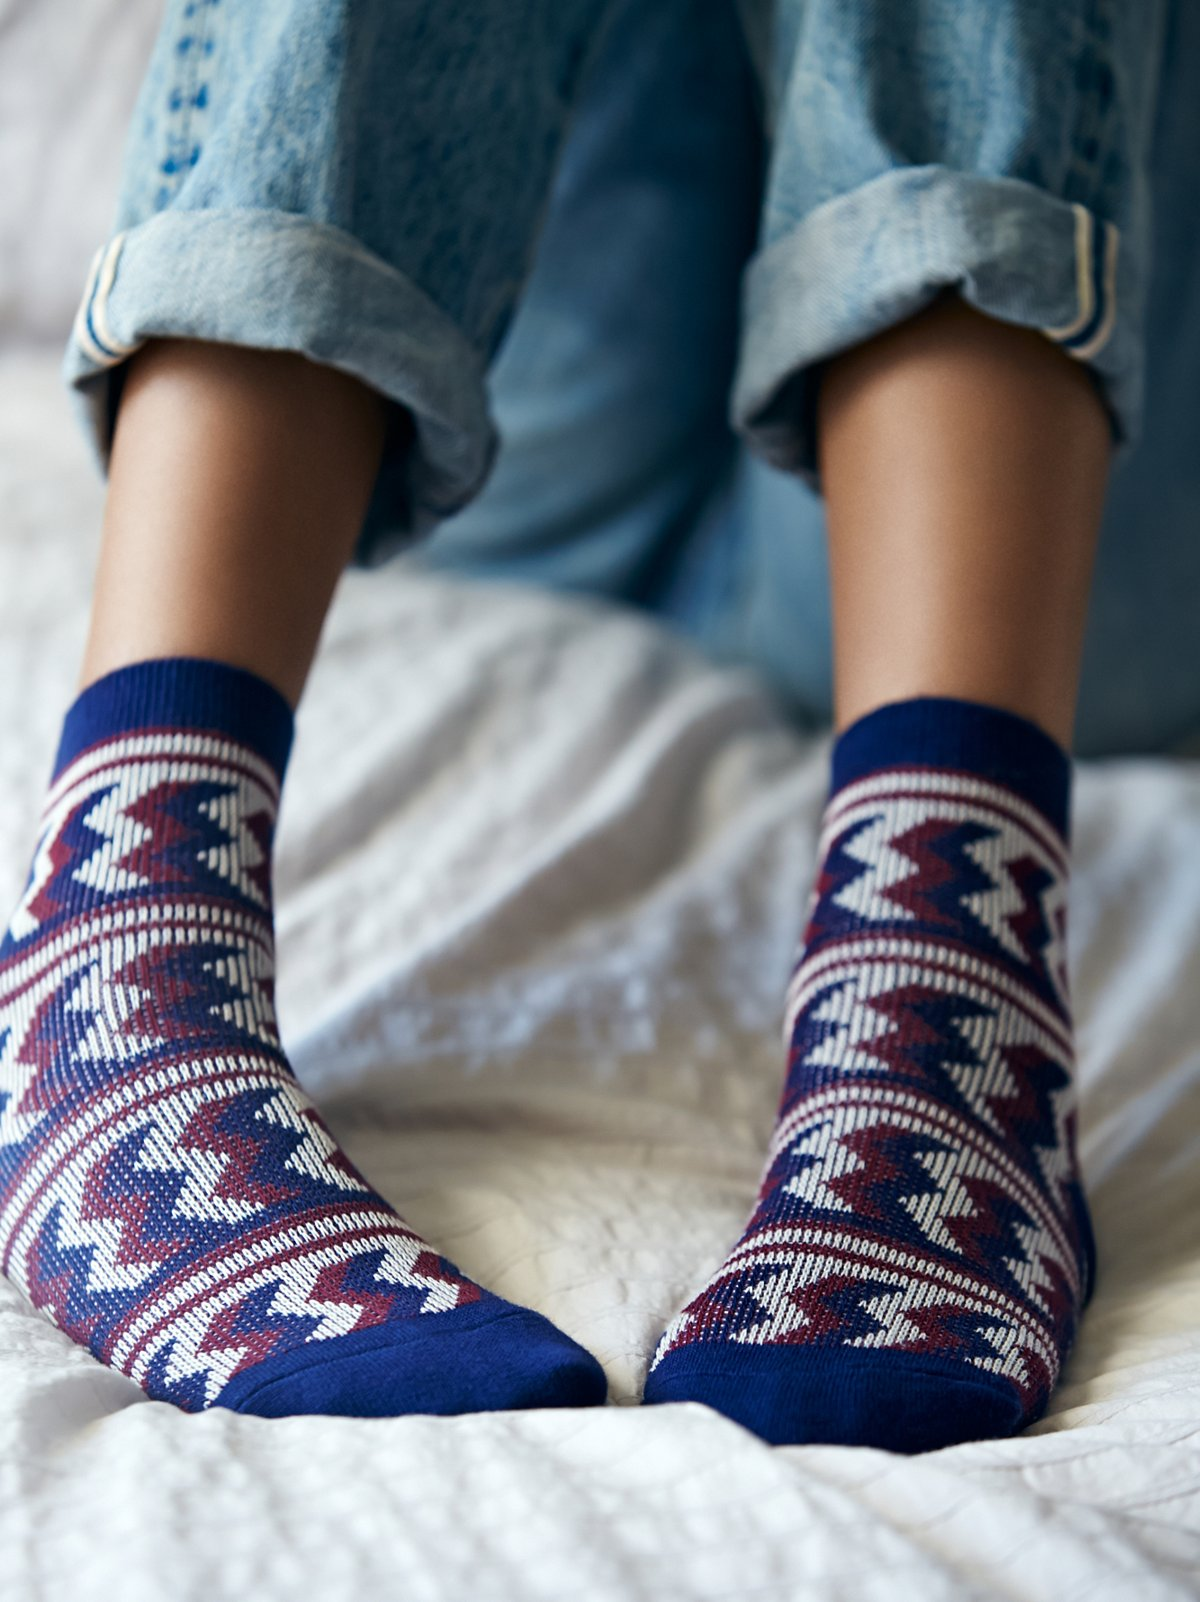 Joan及踝短袜